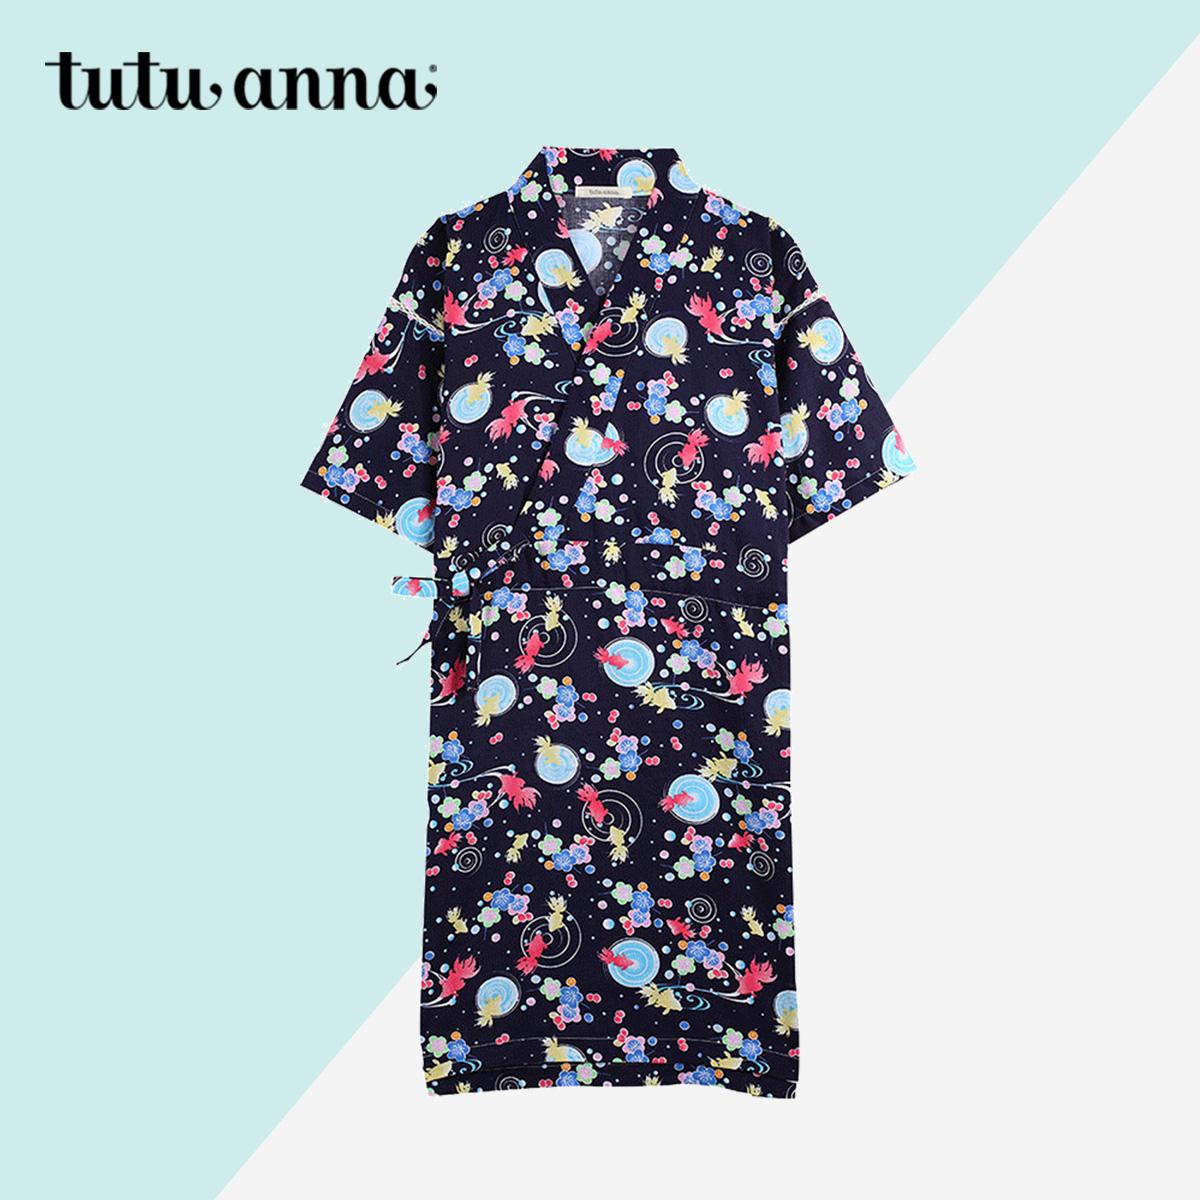 tutuanna睡裙女夏季家居和服休闲可爱金鱼和风纯棉睡衣短薄家居服11月26日最新优惠